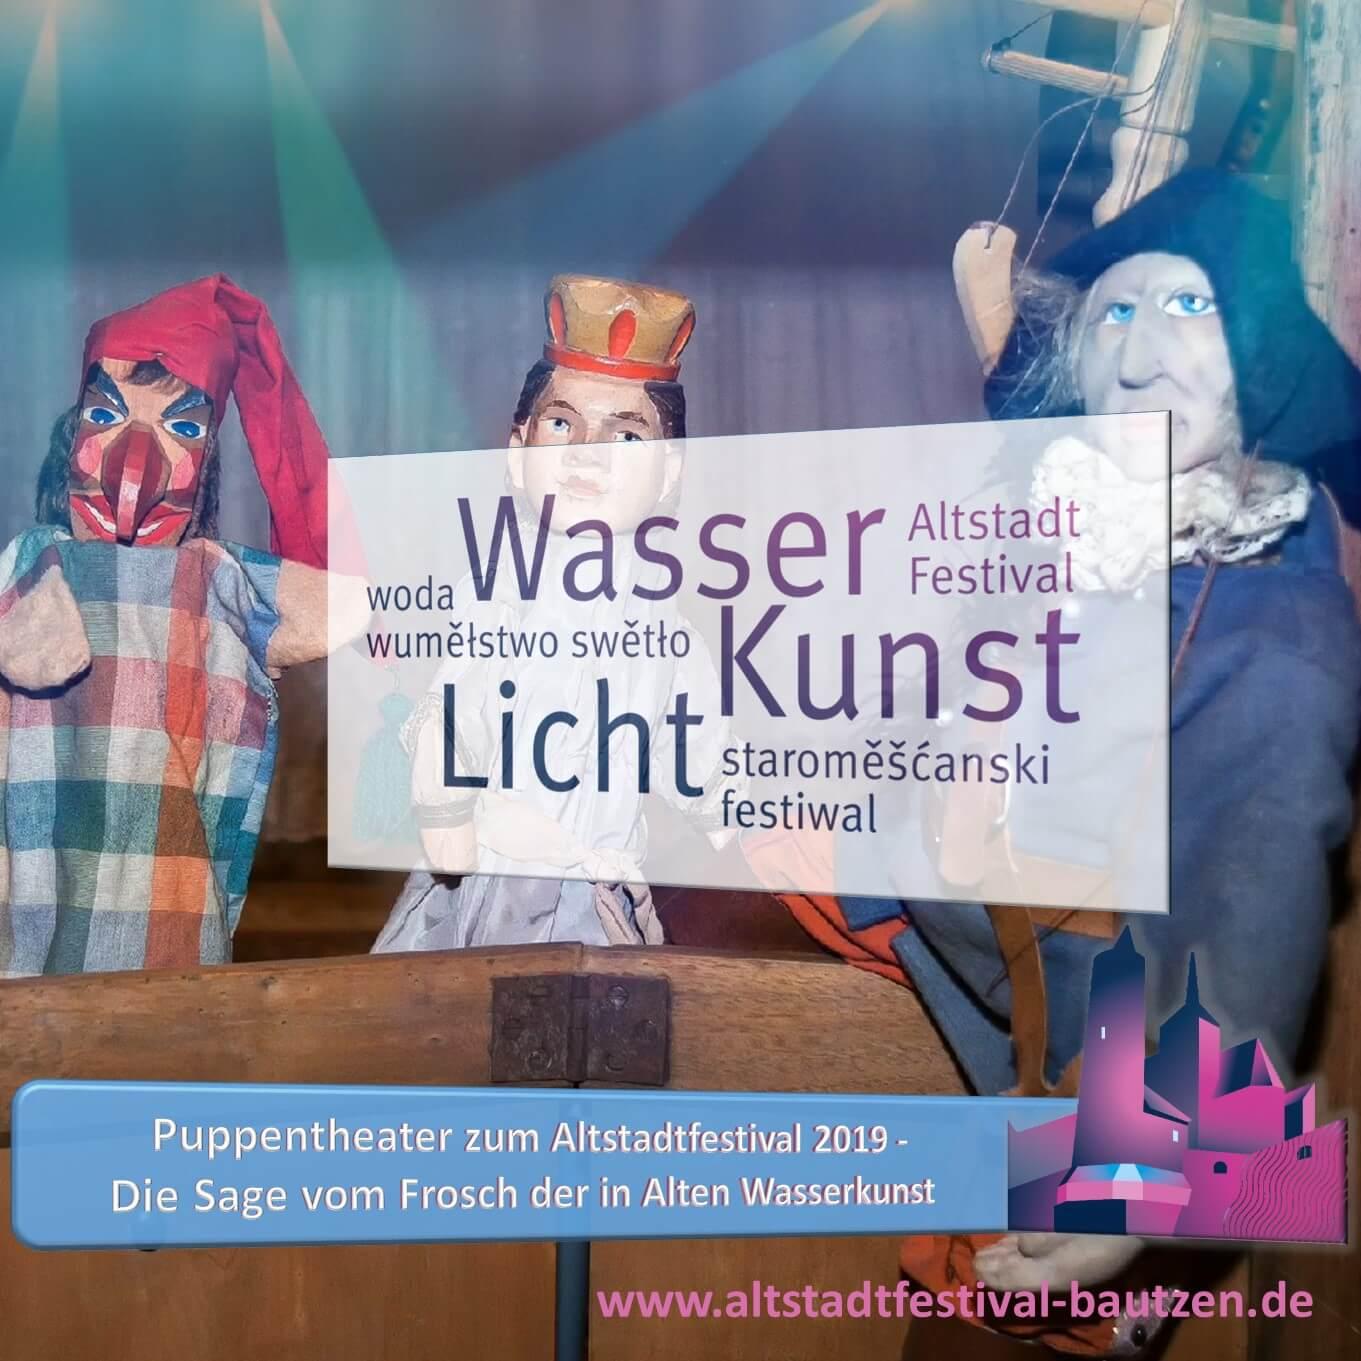 Beitrag Puppentheater zum Altstadtfestival 2019